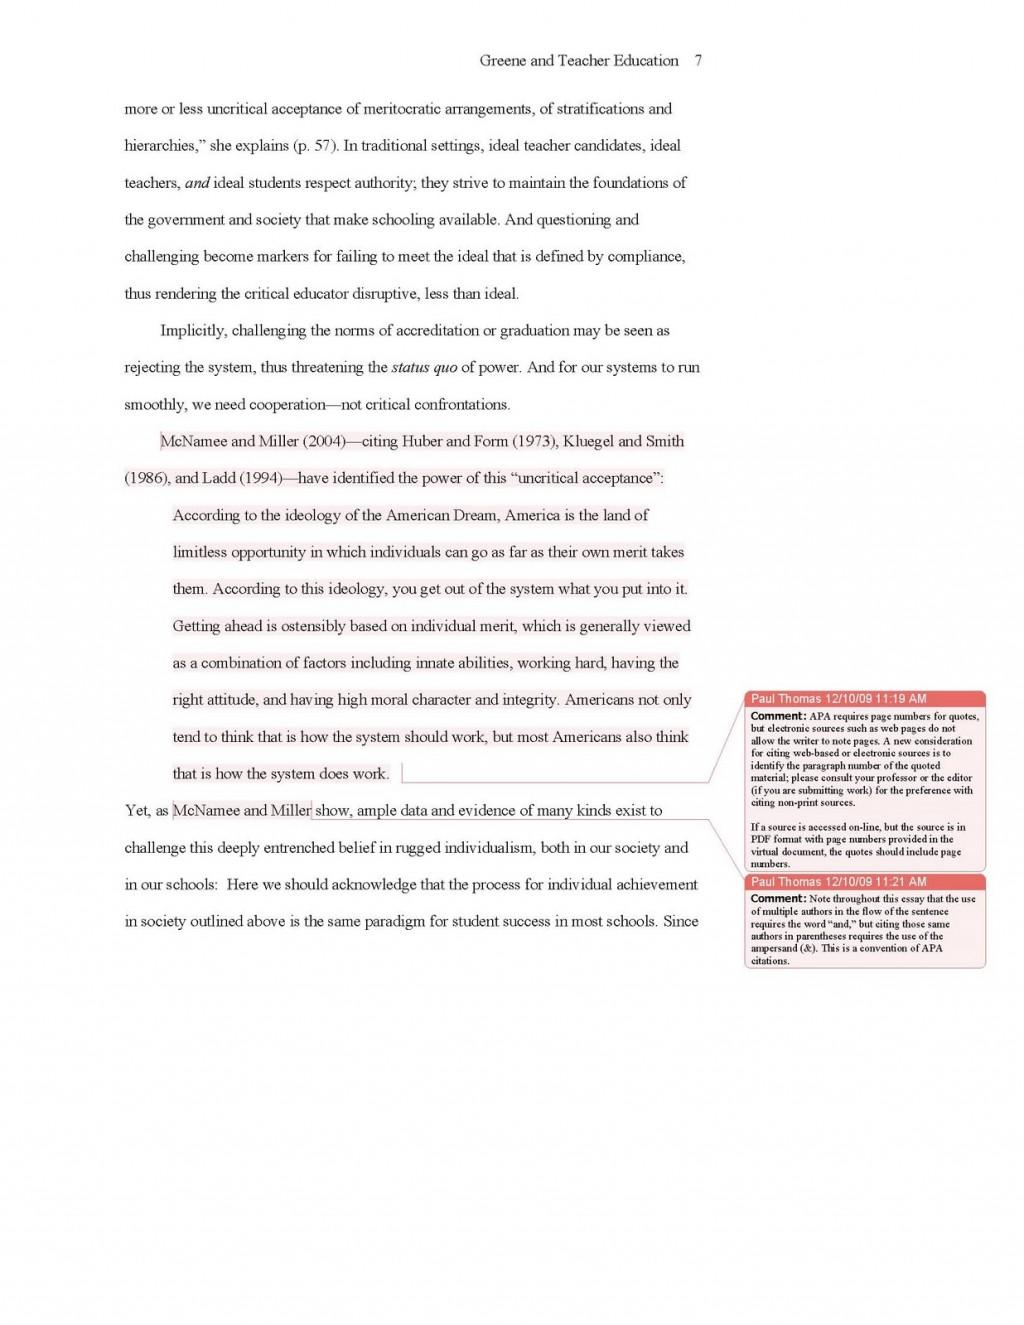 014 Descriptive Essay Thesis Apa Sample 2010update7 Rare Statement Generator Pdf Large